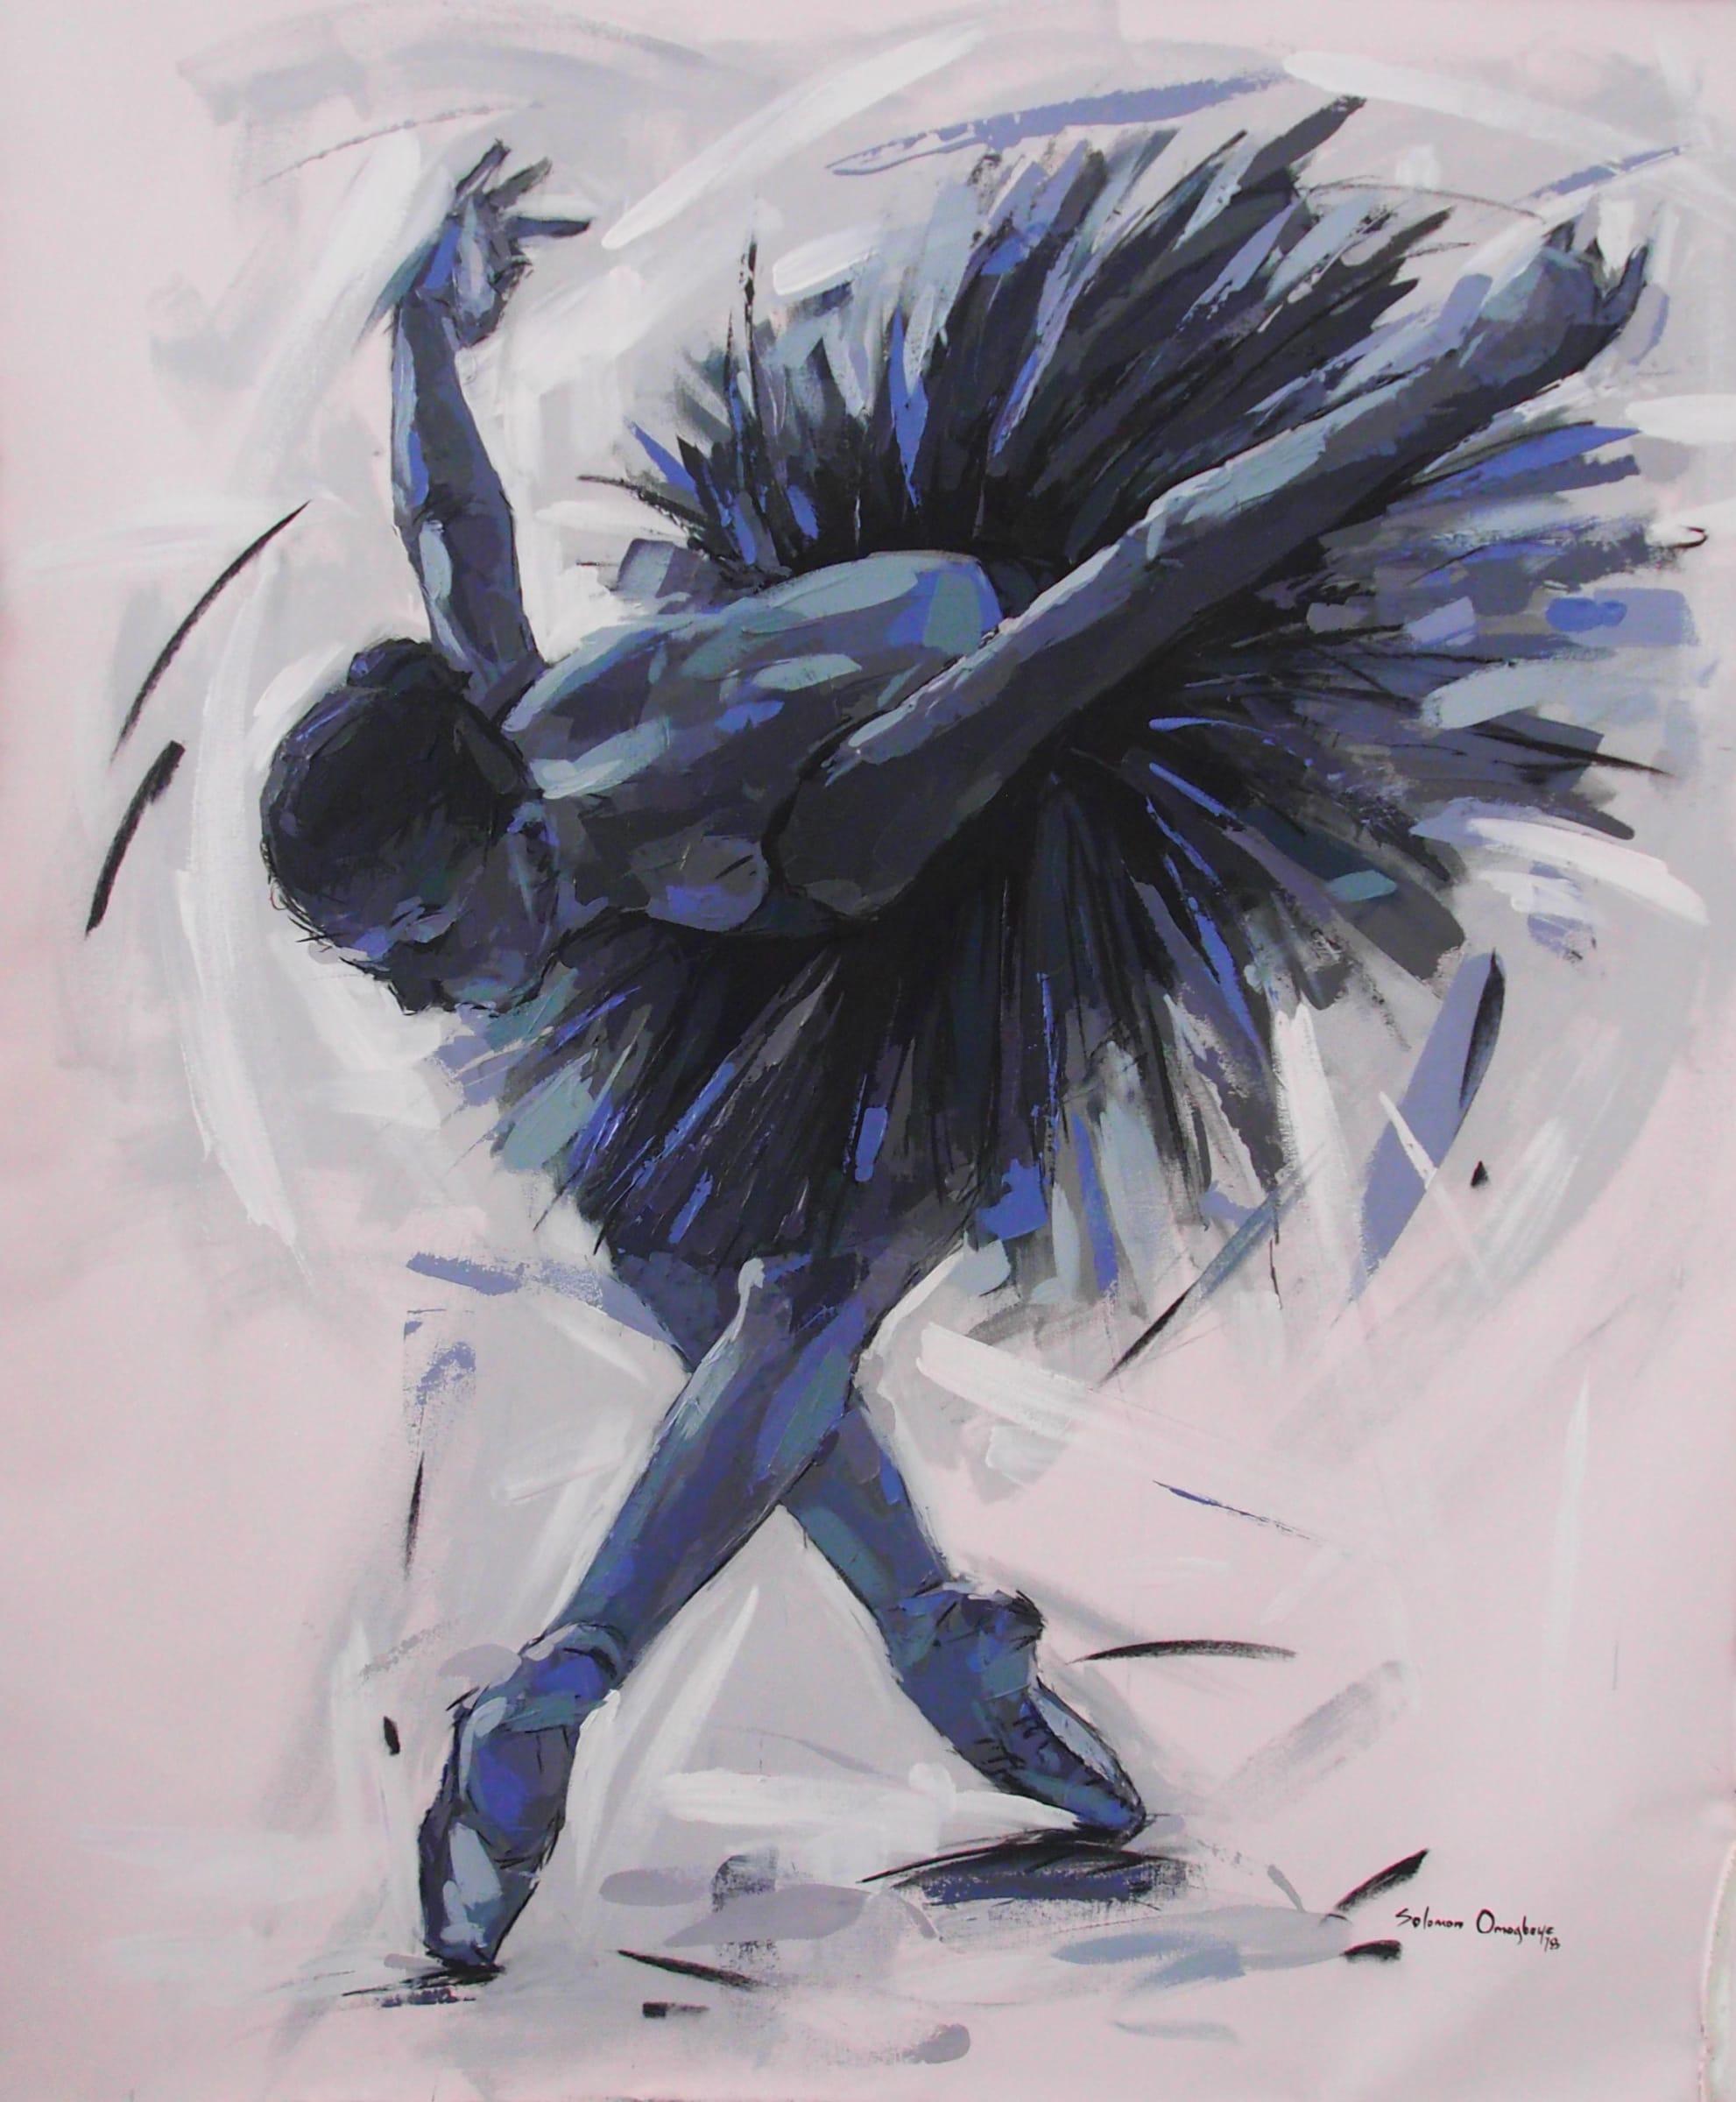 <span class=&#34;link fancybox-details-link&#34;><a href=&#34;/artists/39-solomon-omogboye/works/2022-solomon-omogboye-ballerina-2018/&#34;>View Detail Page</a></span><div class=&#34;artist&#34;><strong>Solomon Omogboye</strong></div> <div class=&#34;title&#34;><em>Ballerina</em>, 2018</div> <div class=&#34;medium&#34;>Acrylic On Canvas</div> <div class=&#34;dimensions&#34;>138.5cm x 163cm (159.6cm x 183.9cm framed)</div>